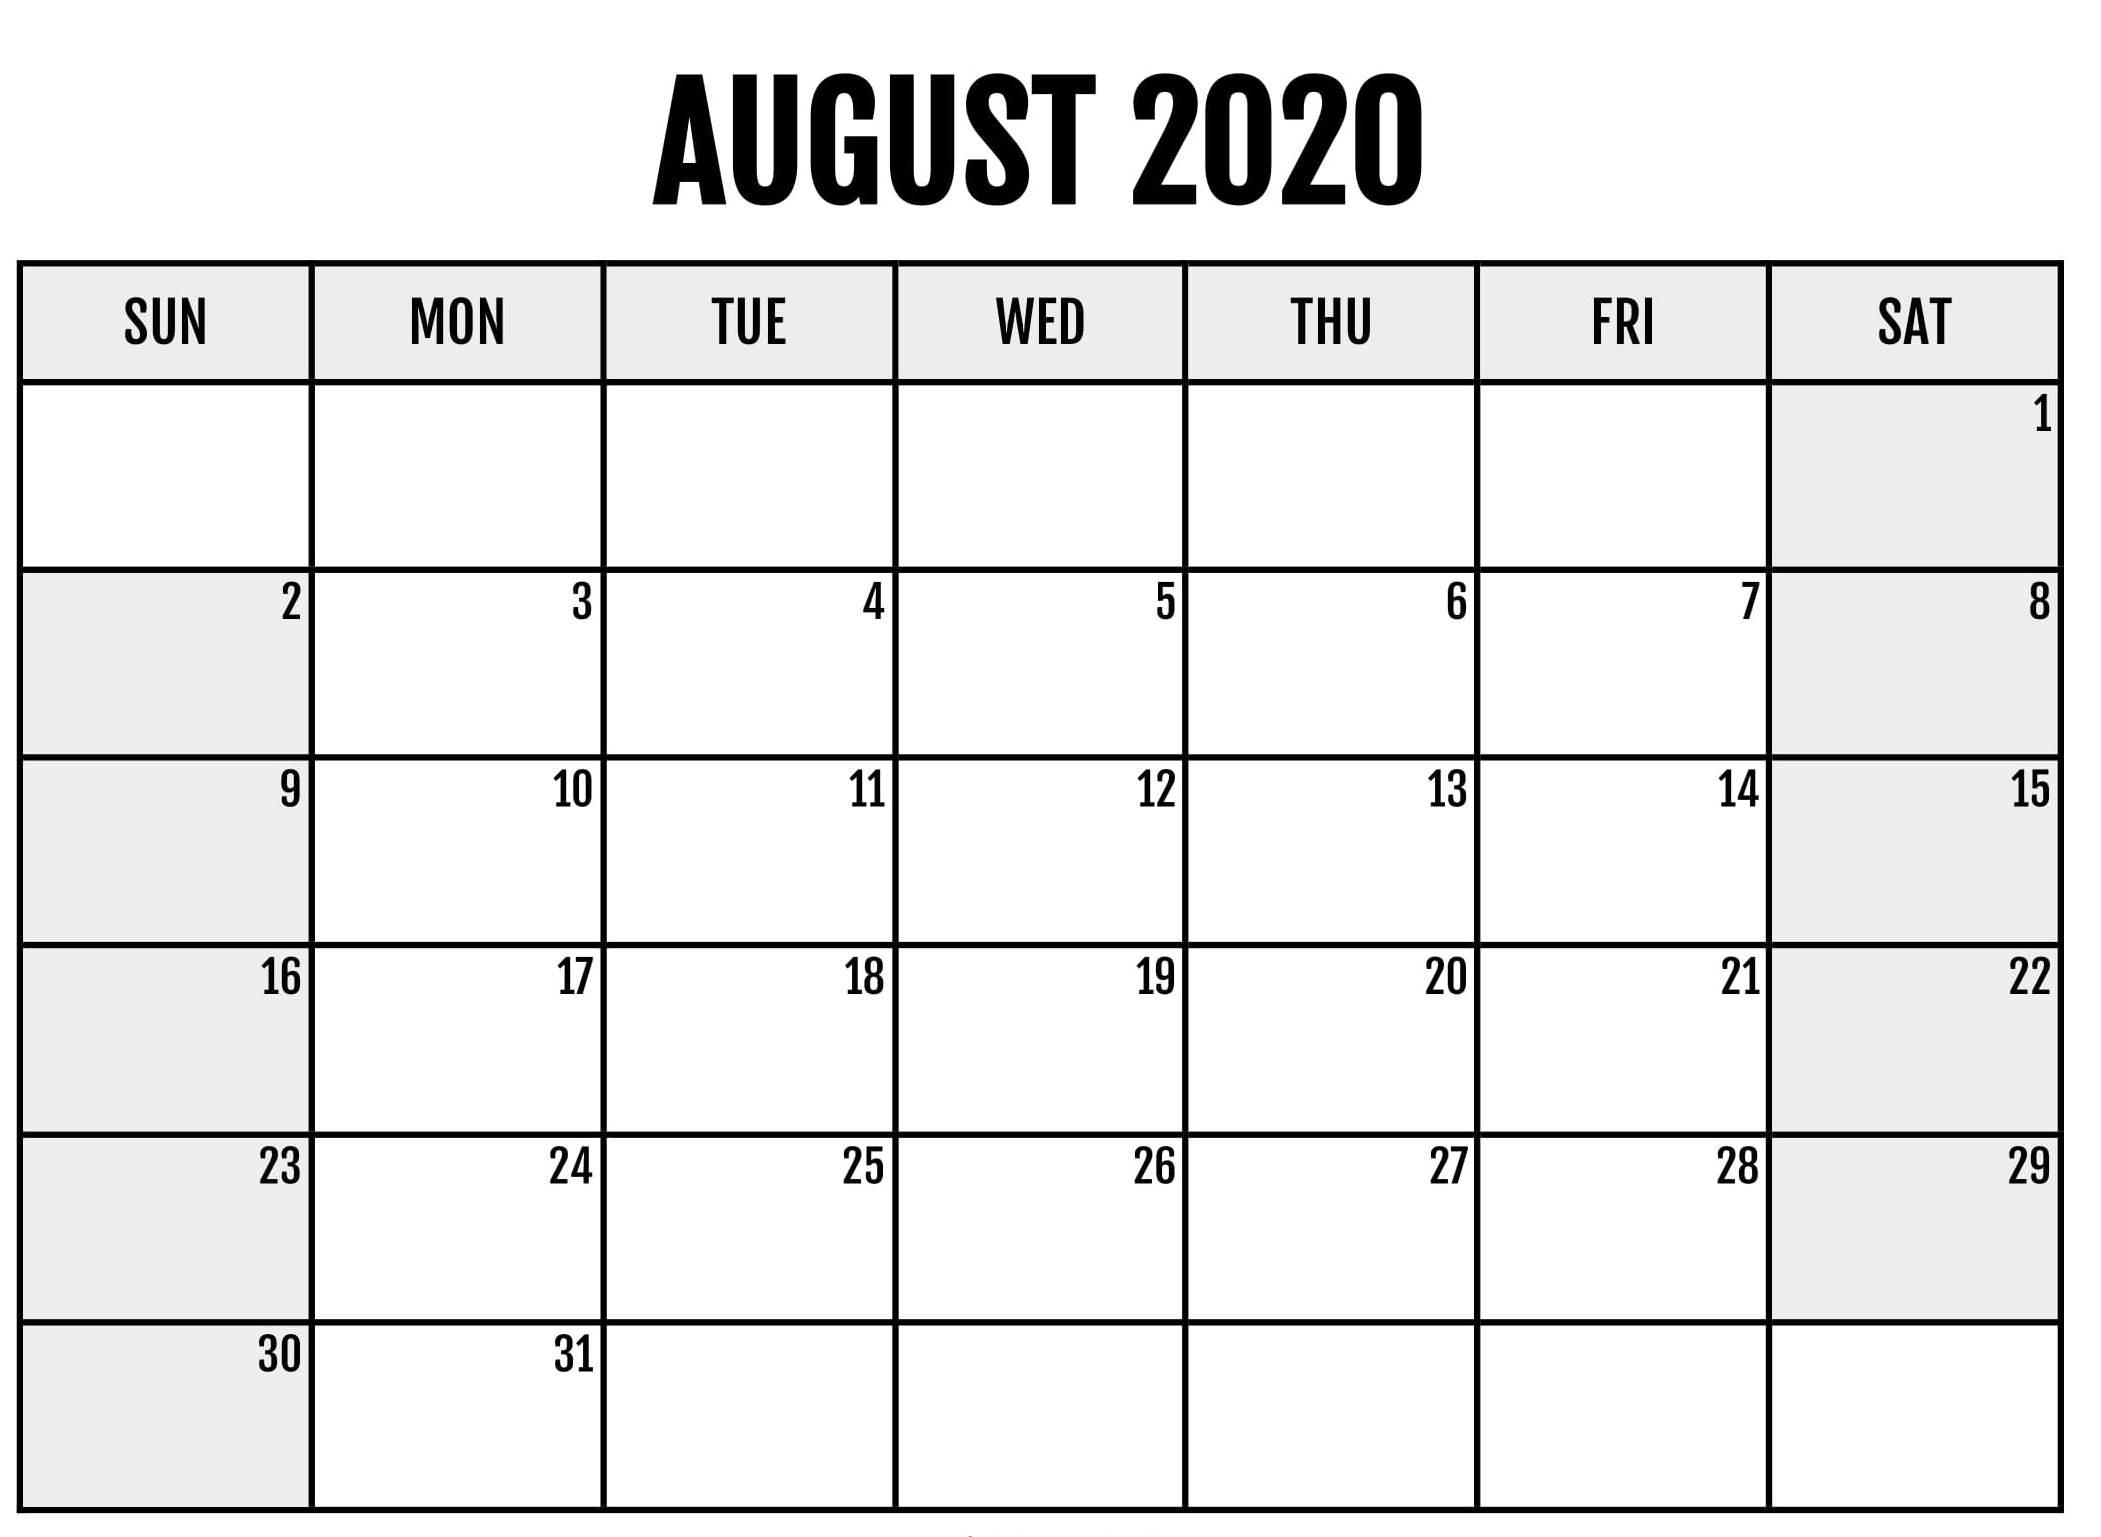 Free Printable August 2020 Calendar Blank Editable - Digital within Free Editable 2020 Calendars